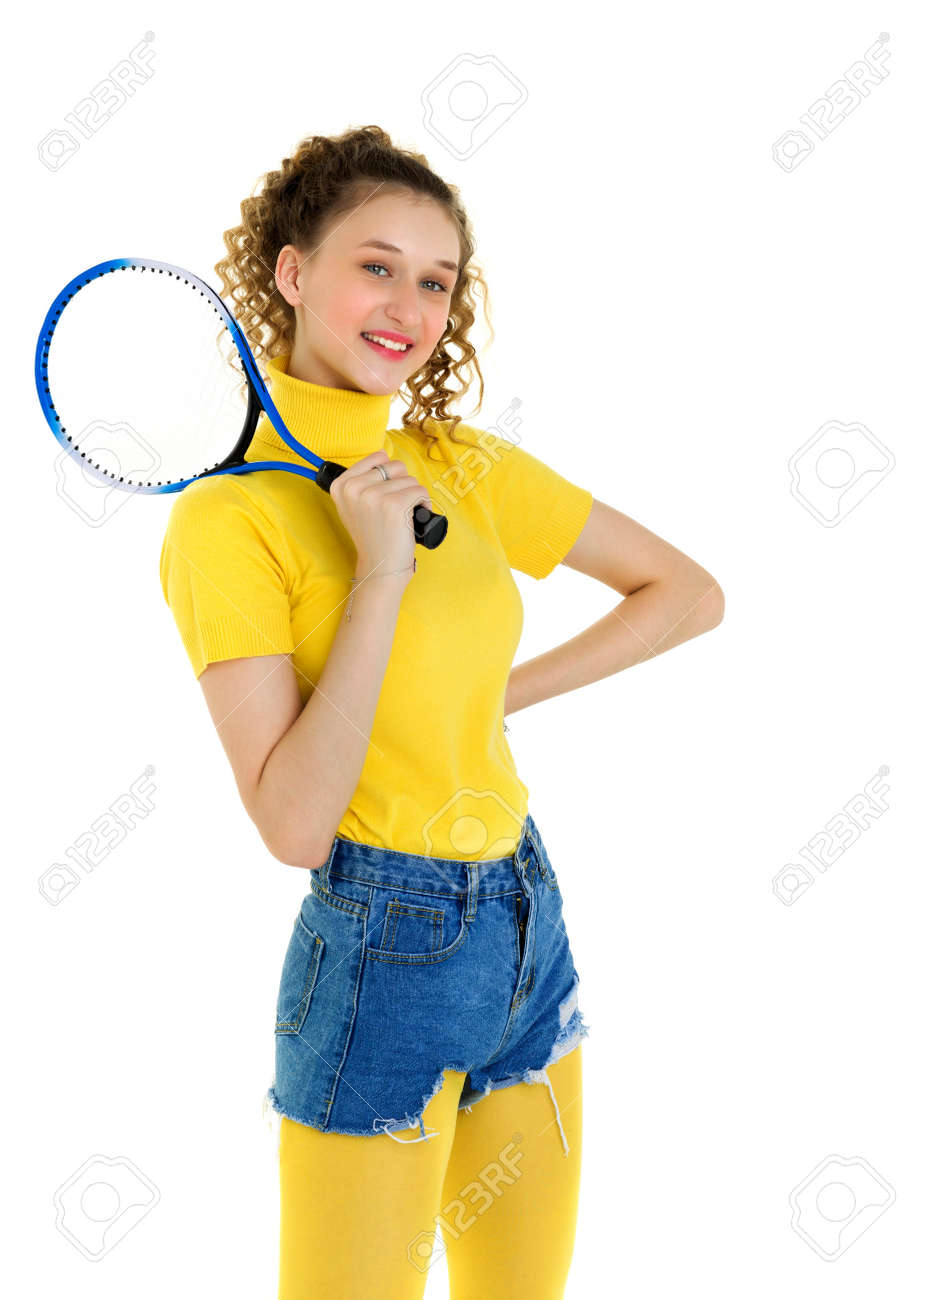 Portrait of happy girl posing with tennis racket - 173414771